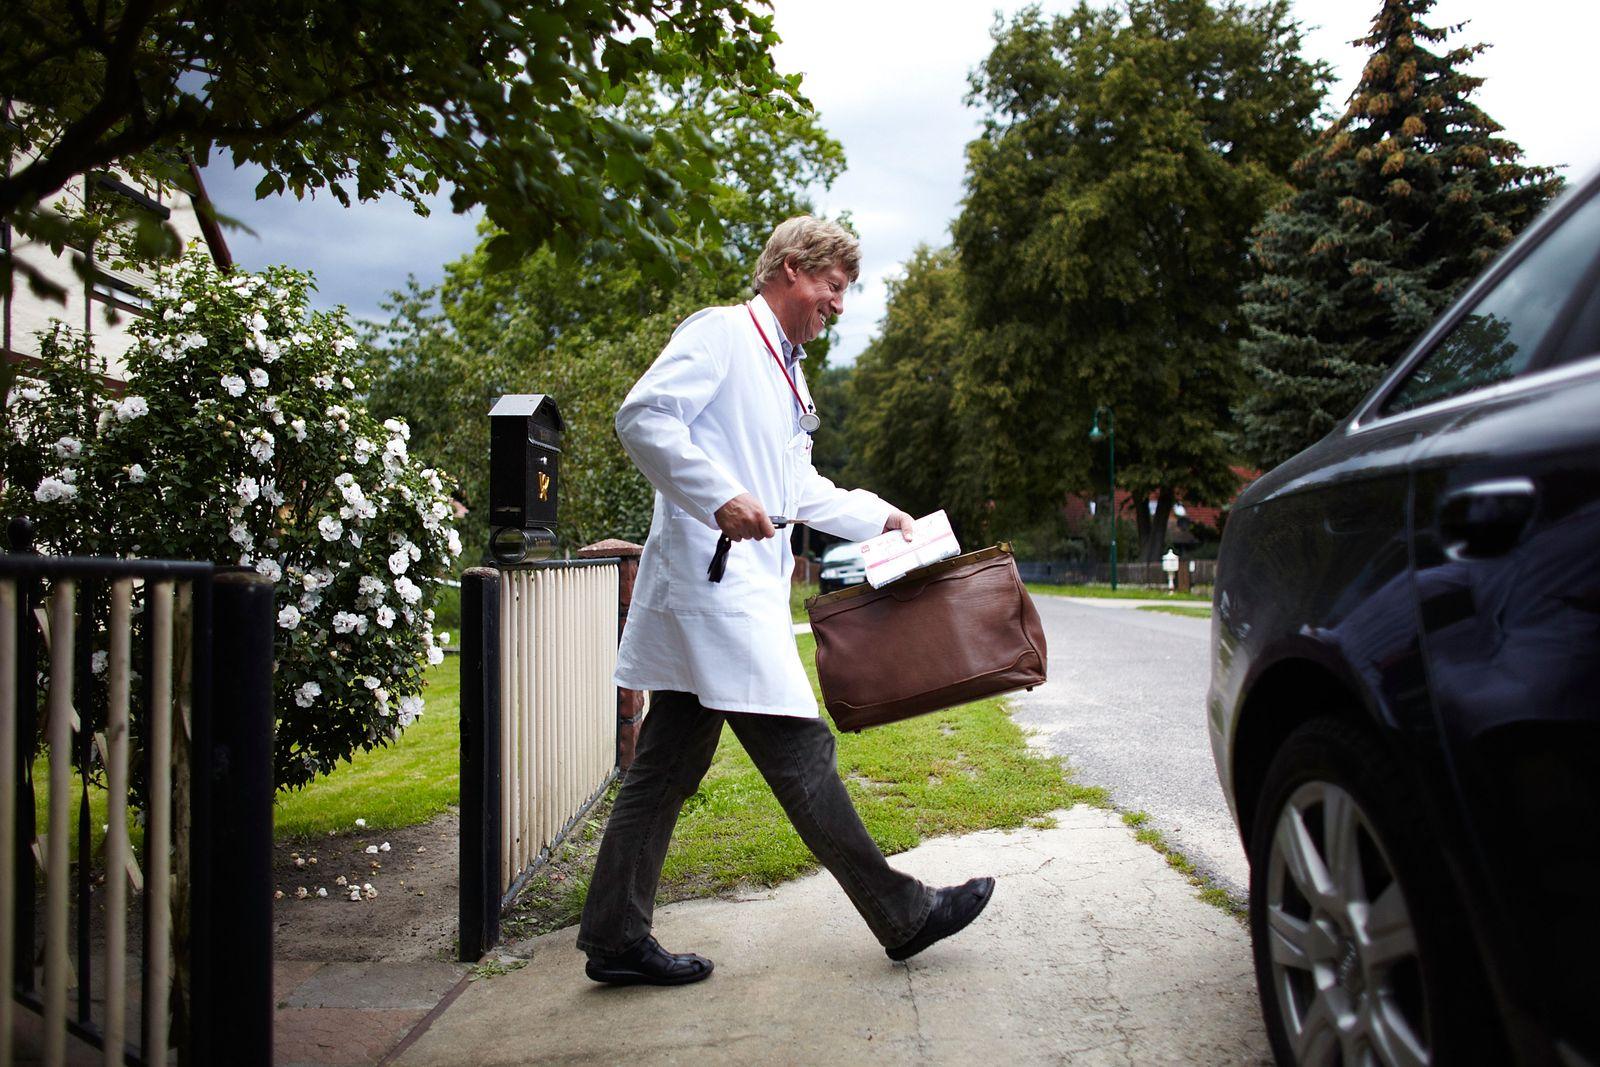 Landarzt / Hausarzt / Hausarztpraxen